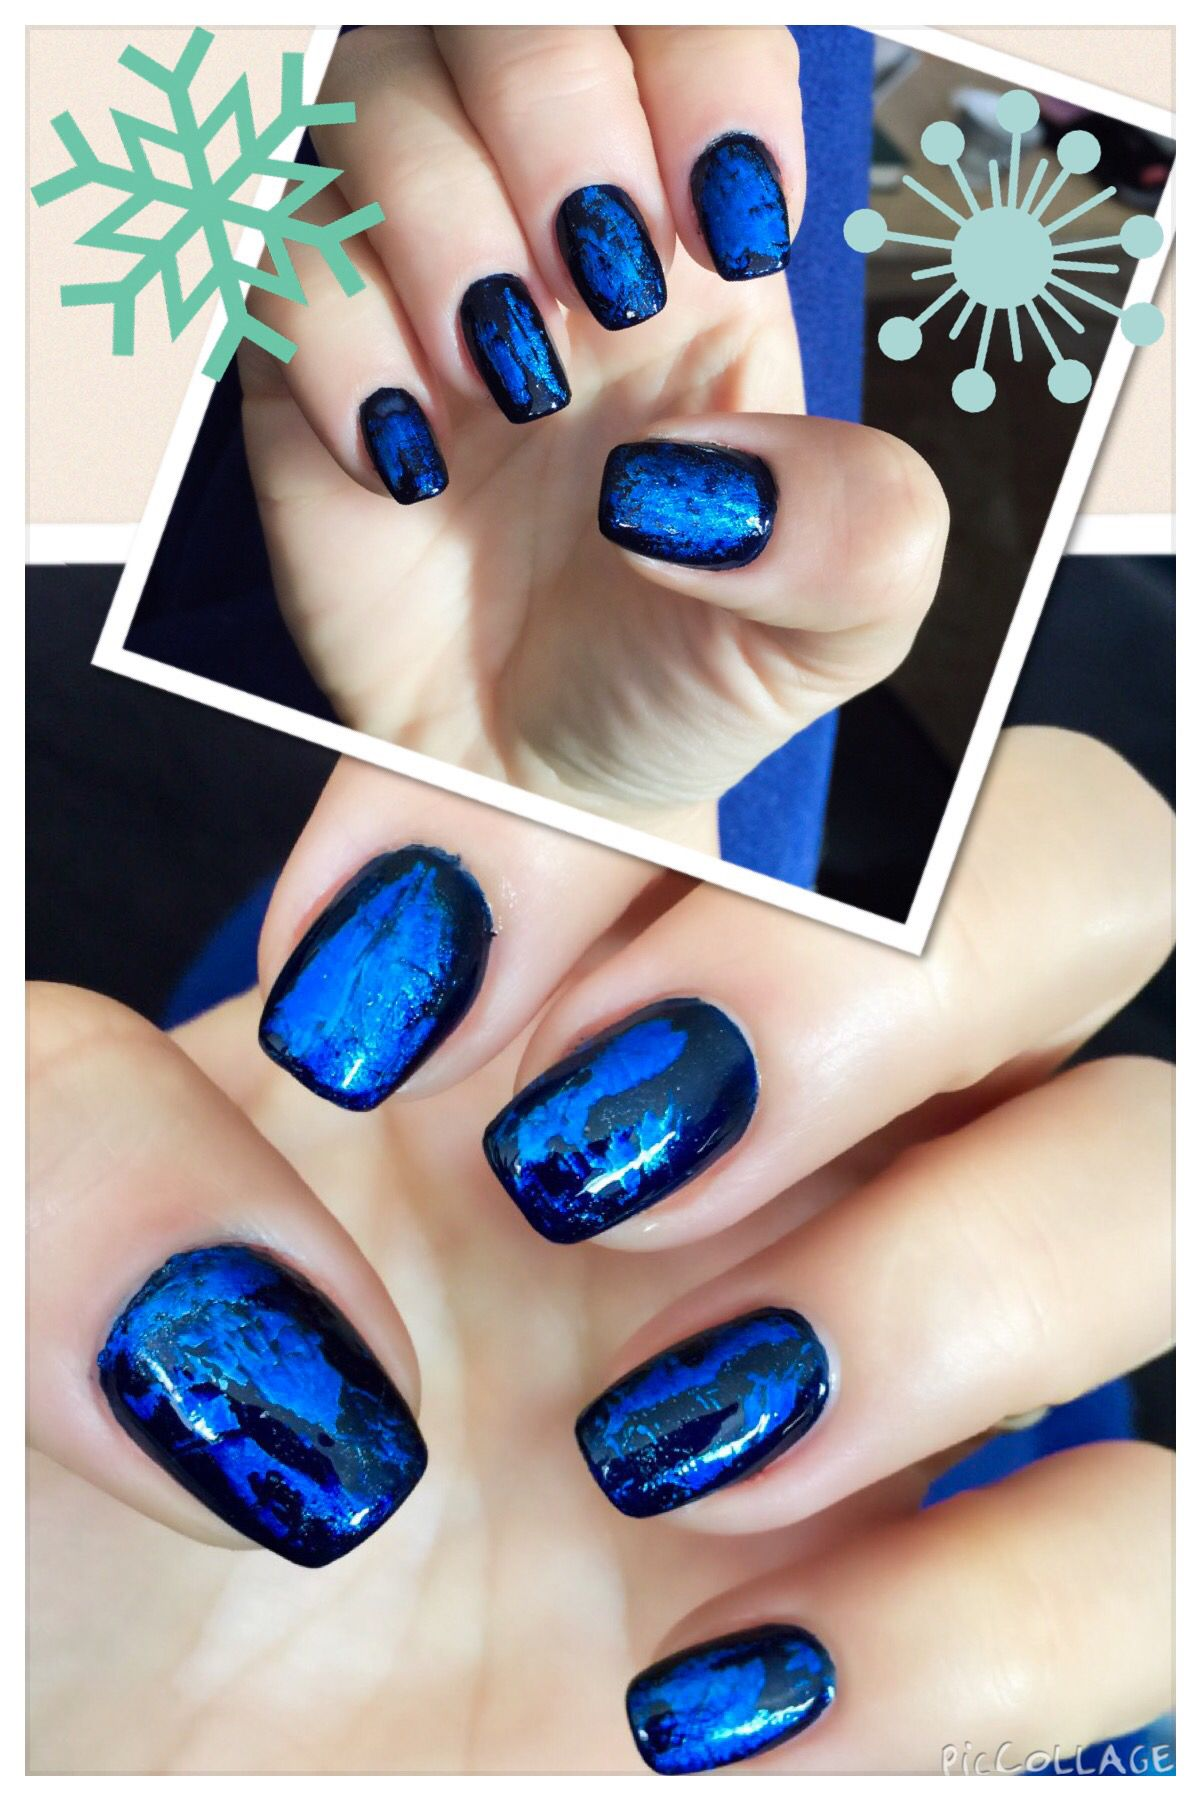 Indigo polish with blue nail foil design.